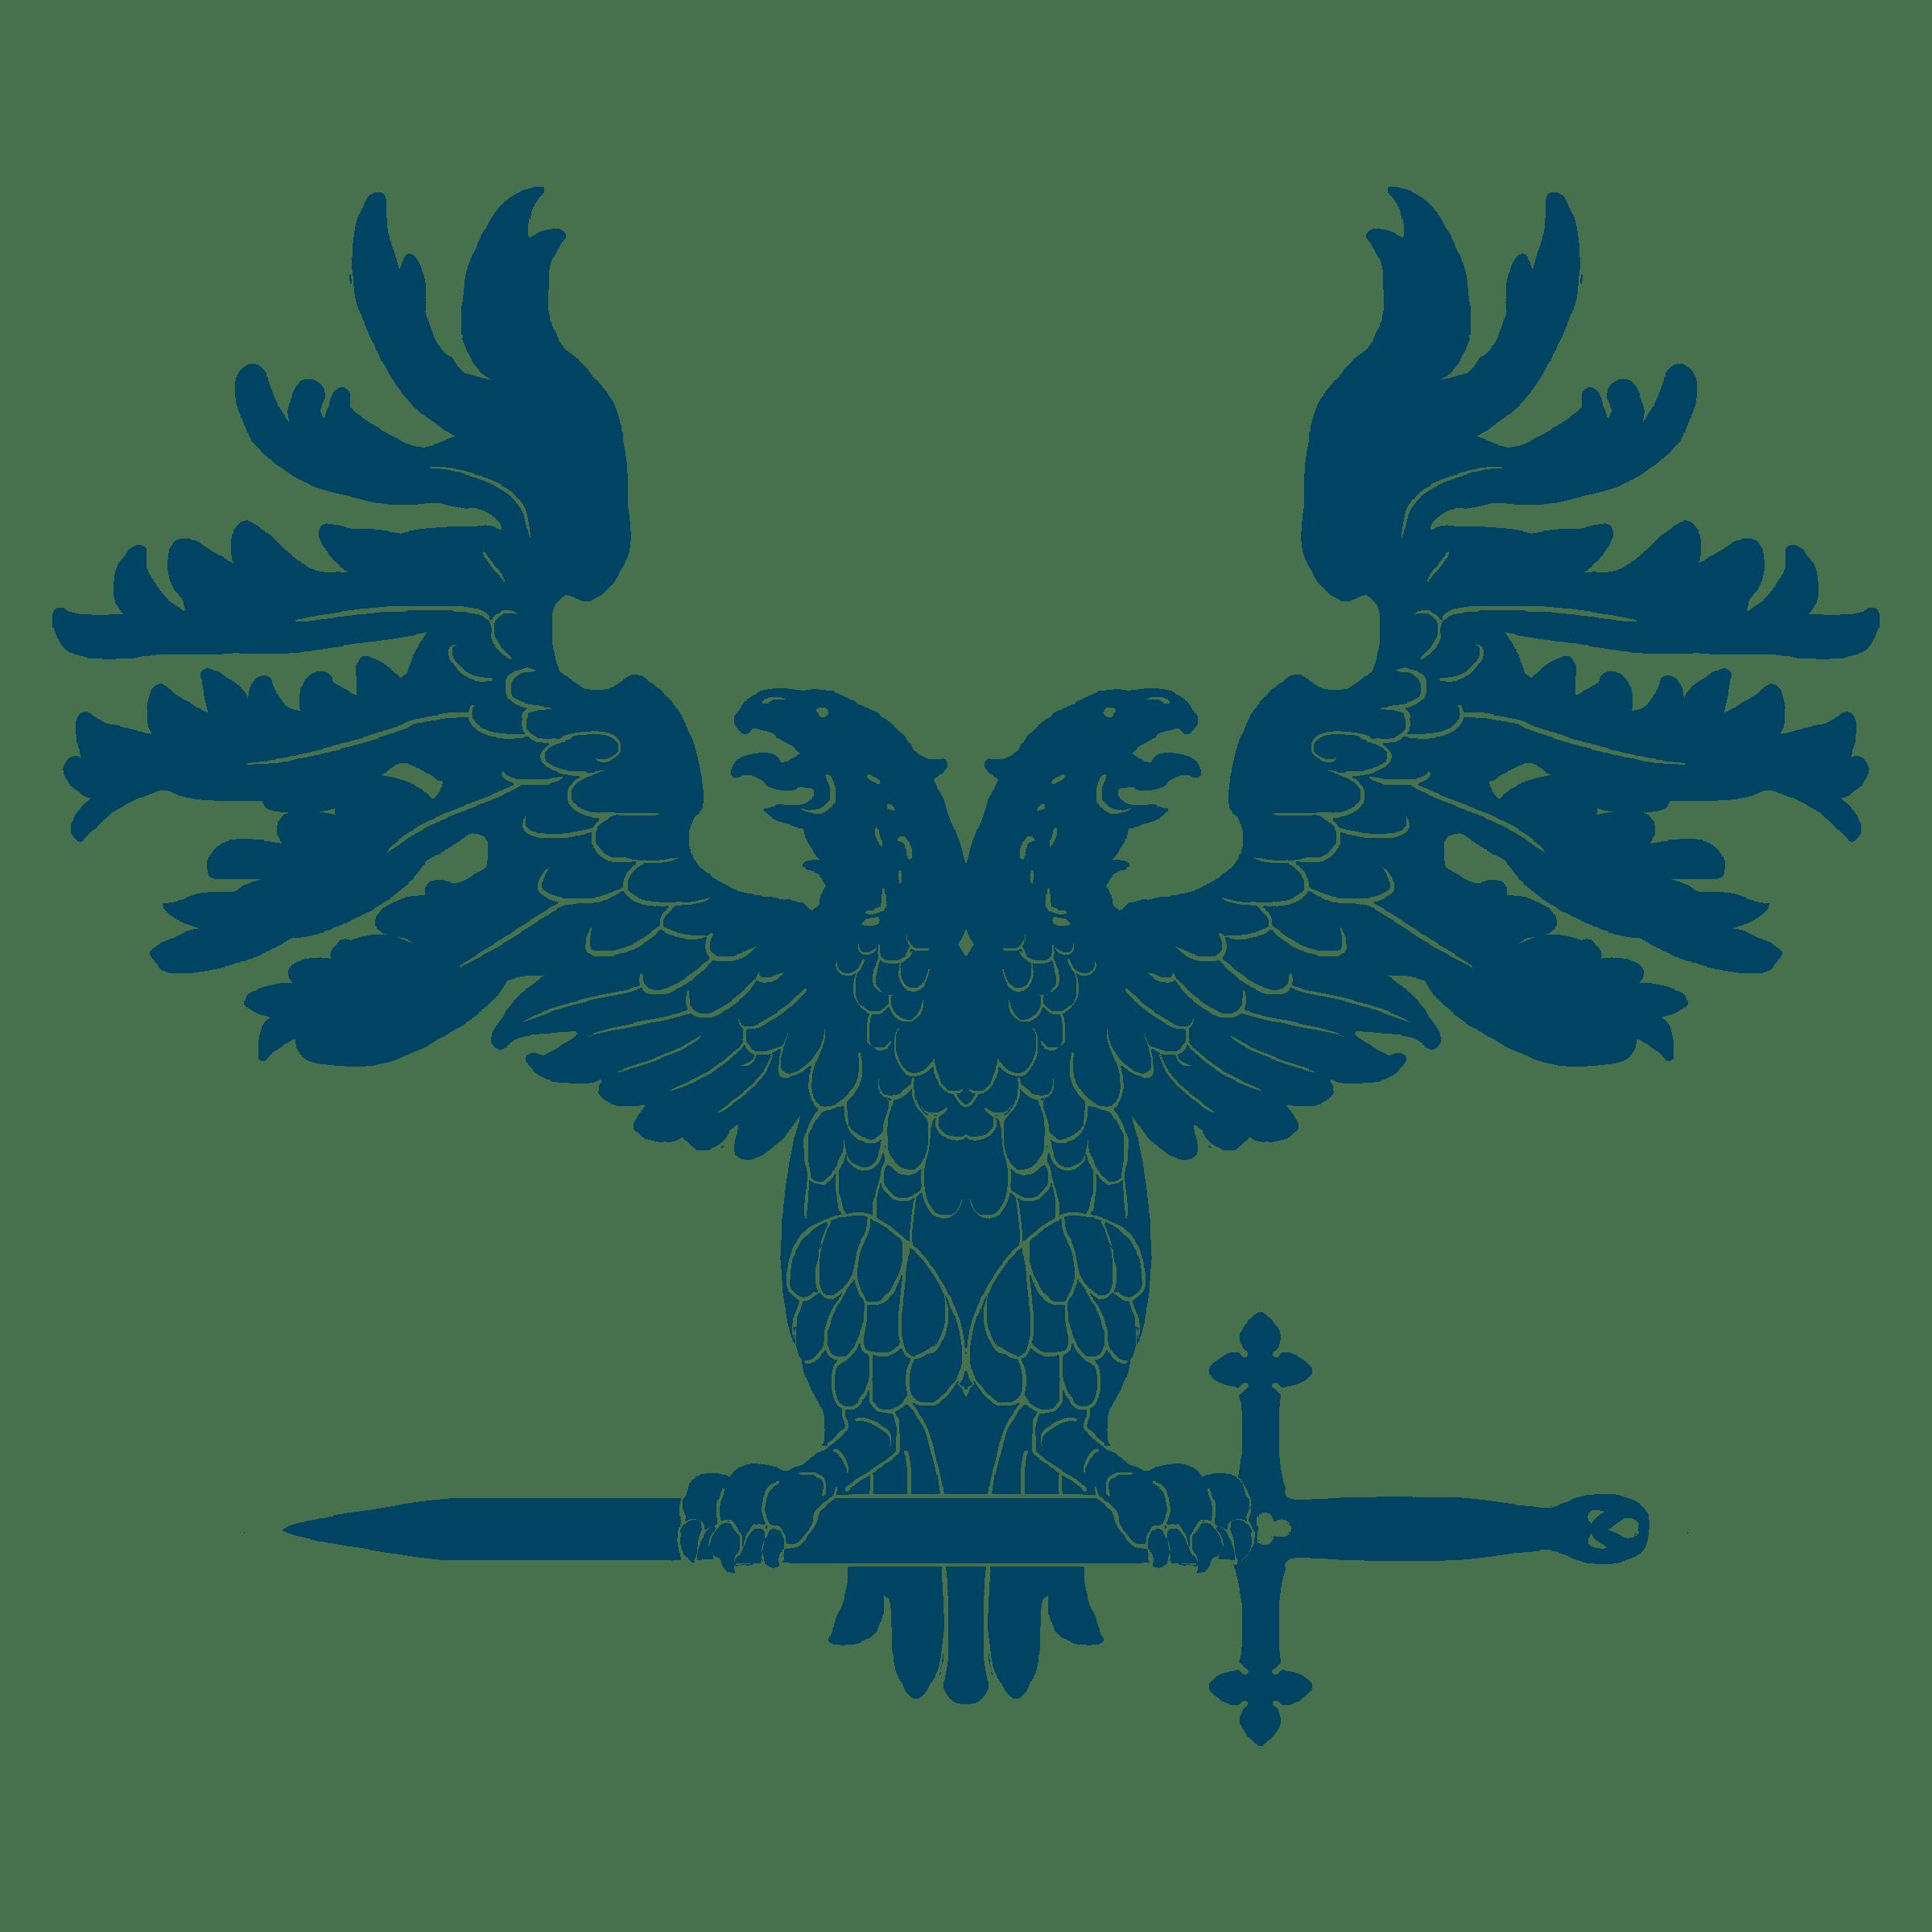 bless online север лого